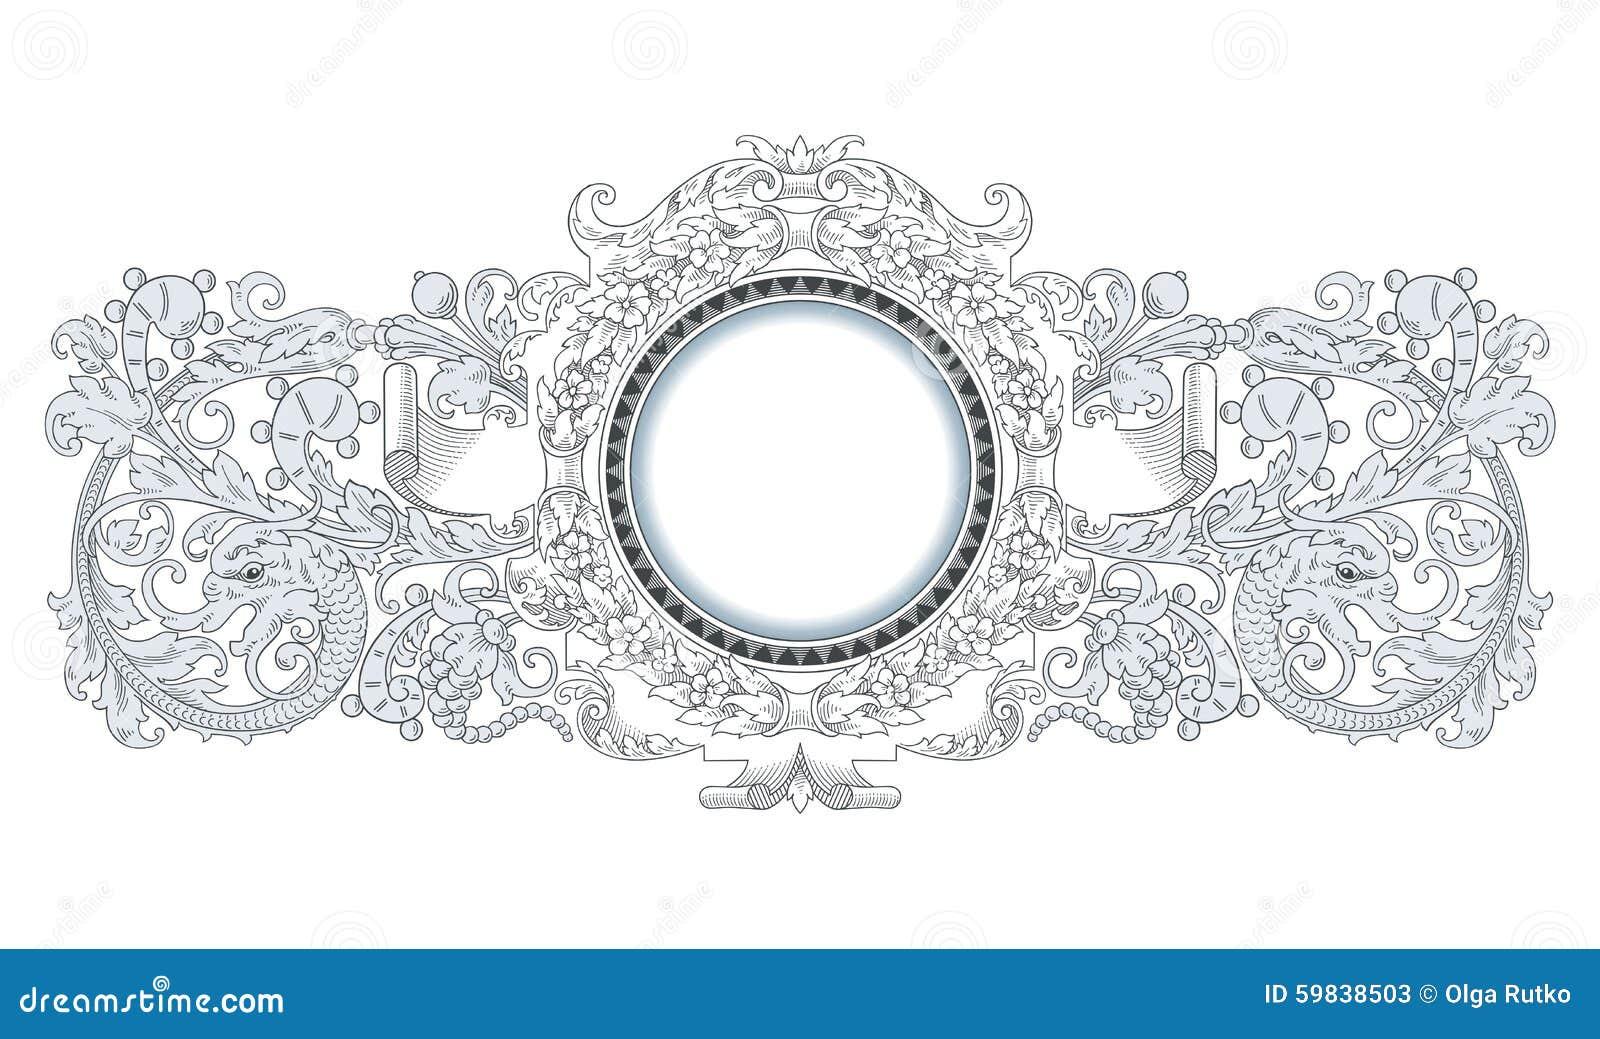 Dragon Frame Ornament stock vector. Illustration of border - 59838503